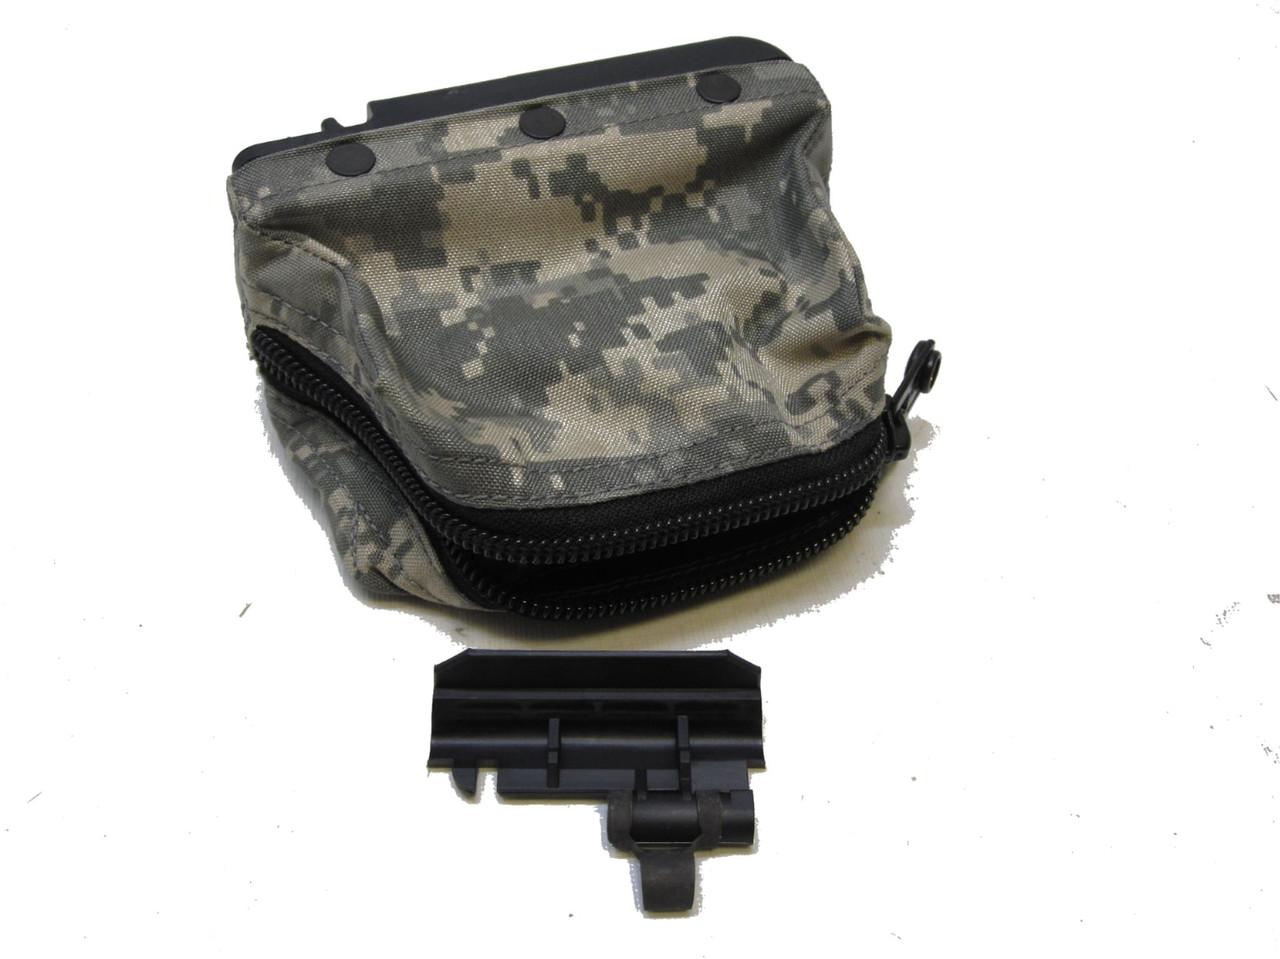 NEW ACU DIGITAL SAW GUNNER POUCH 1OO ROUND NUTSACK SOFT PACK